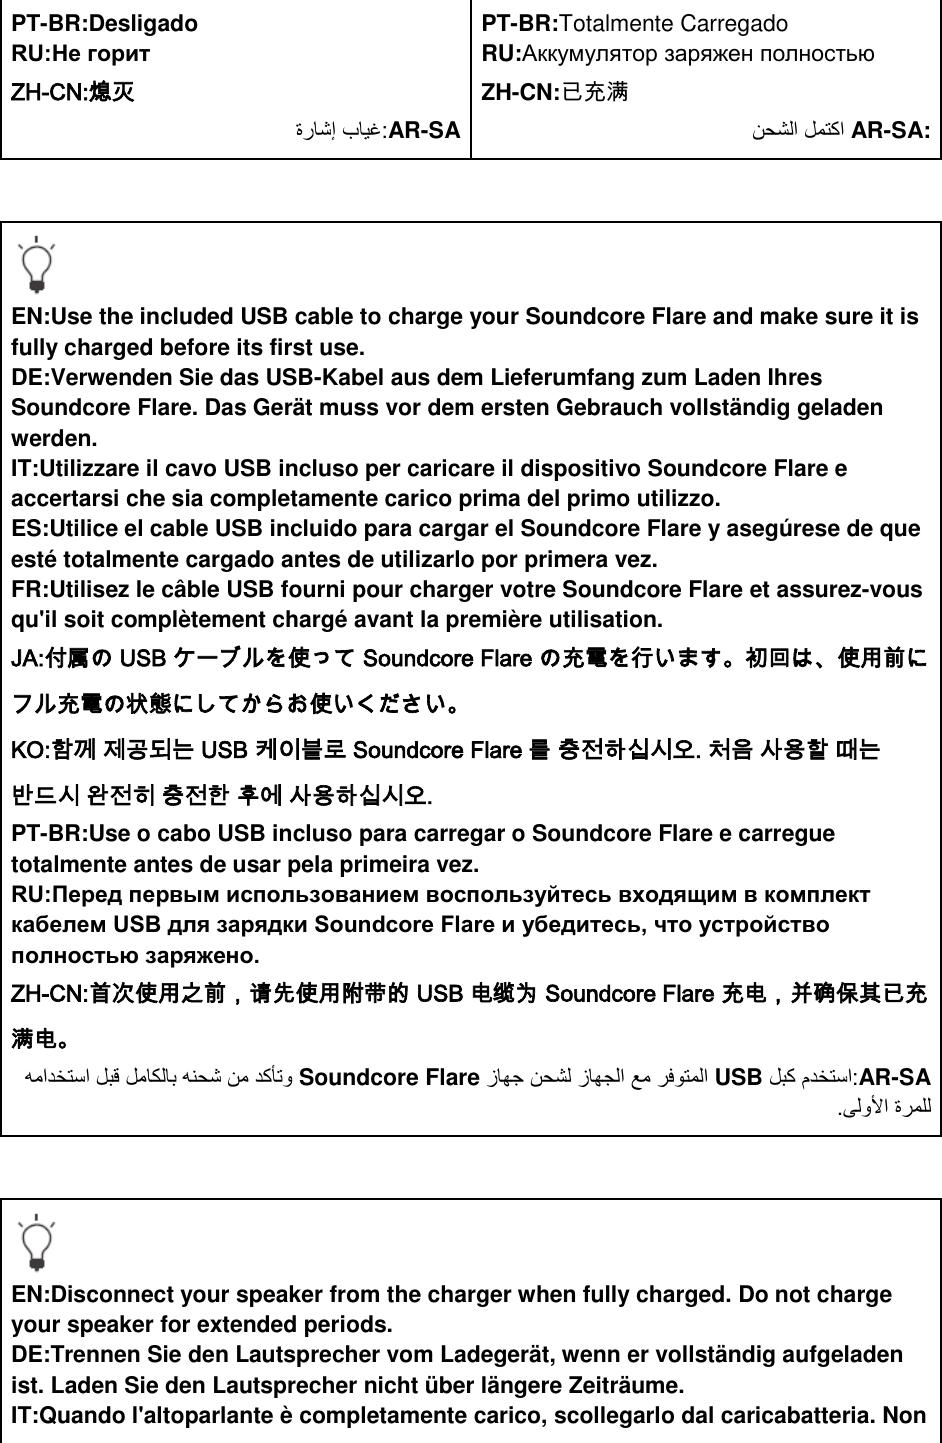 caesar ii user guide pdf